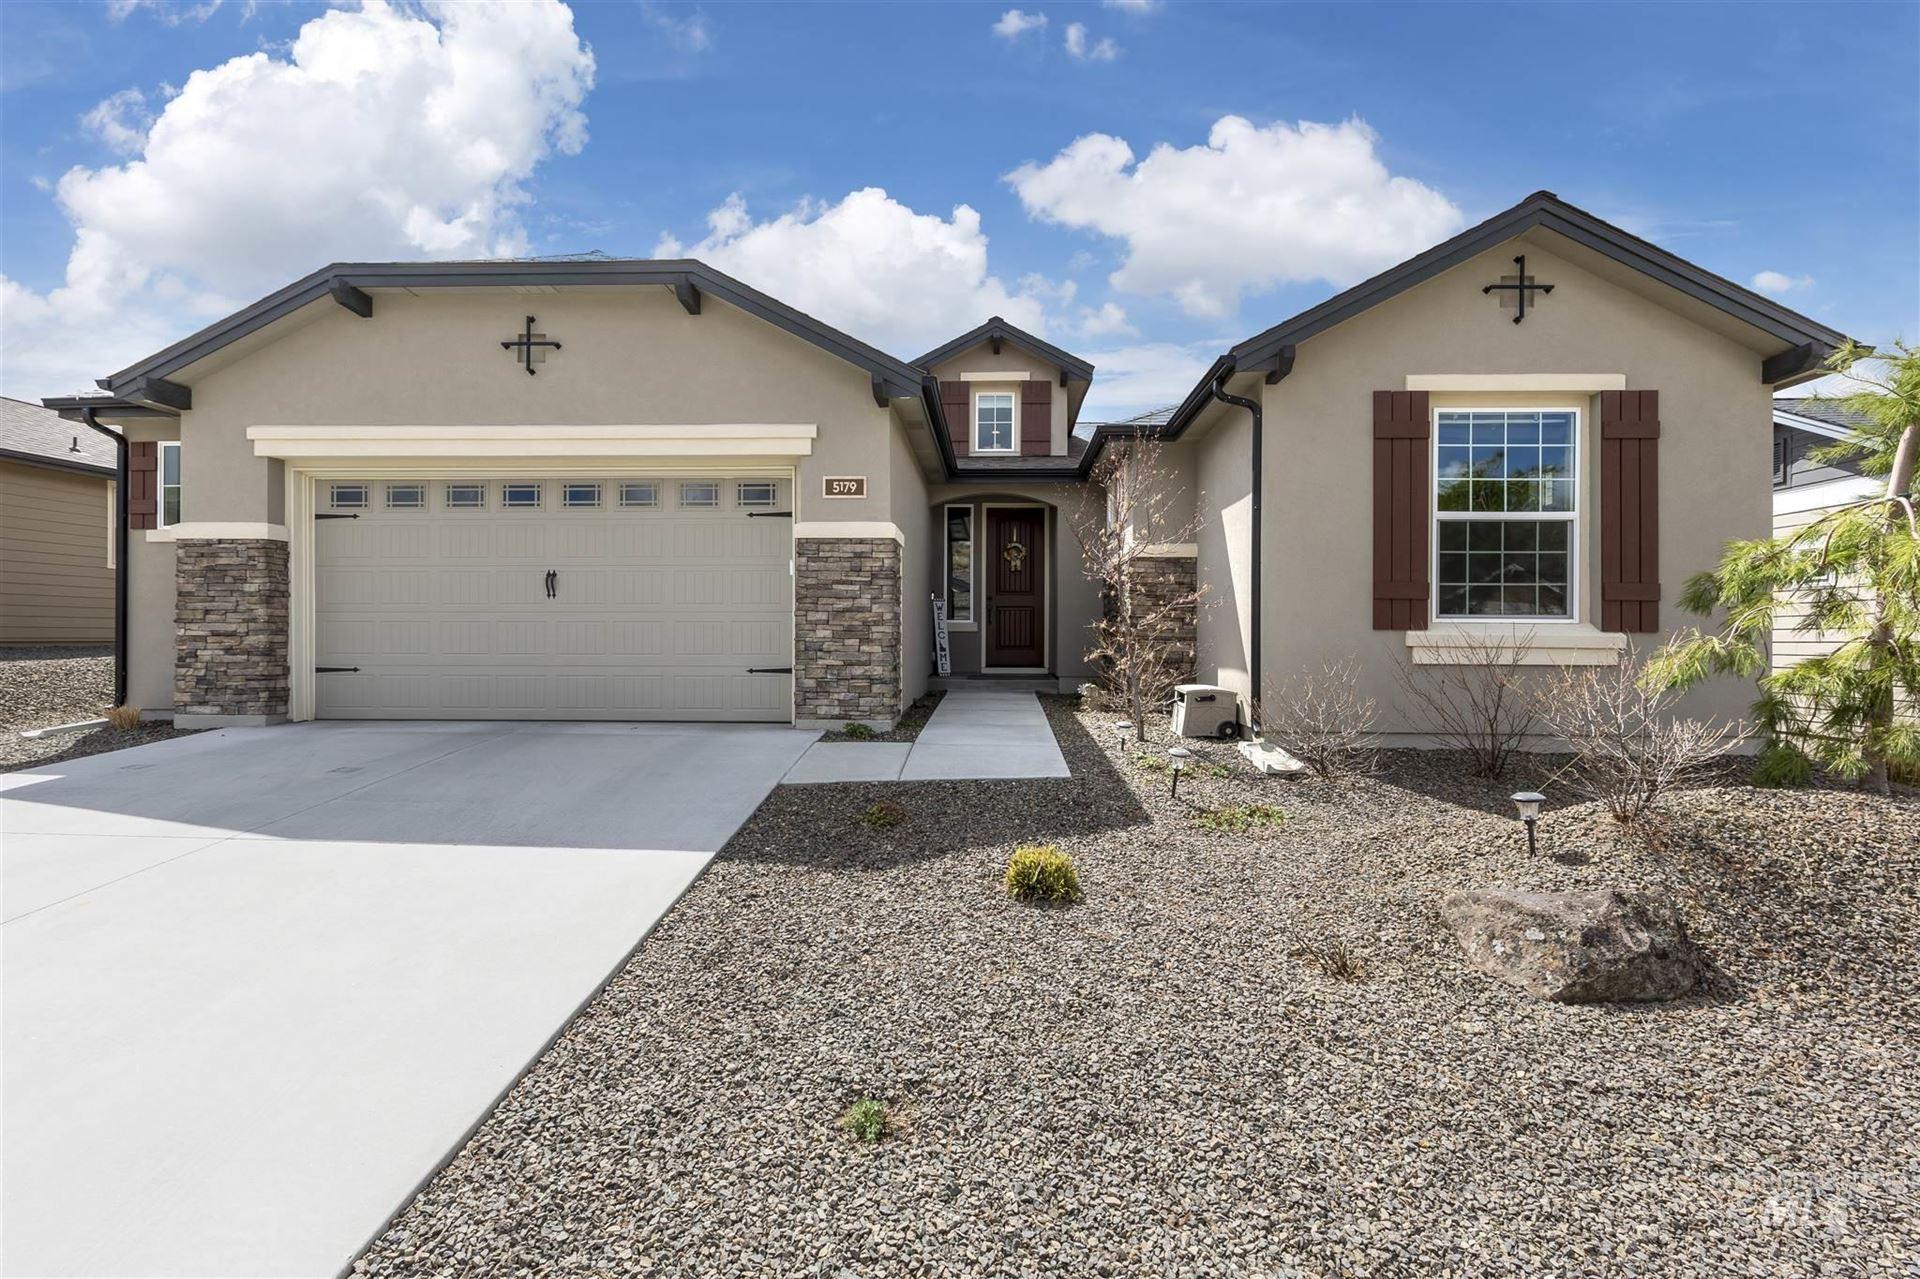 Photo of 5179 W White Hills Dr #289, Boise, ID 83714 (MLS # 98798929)